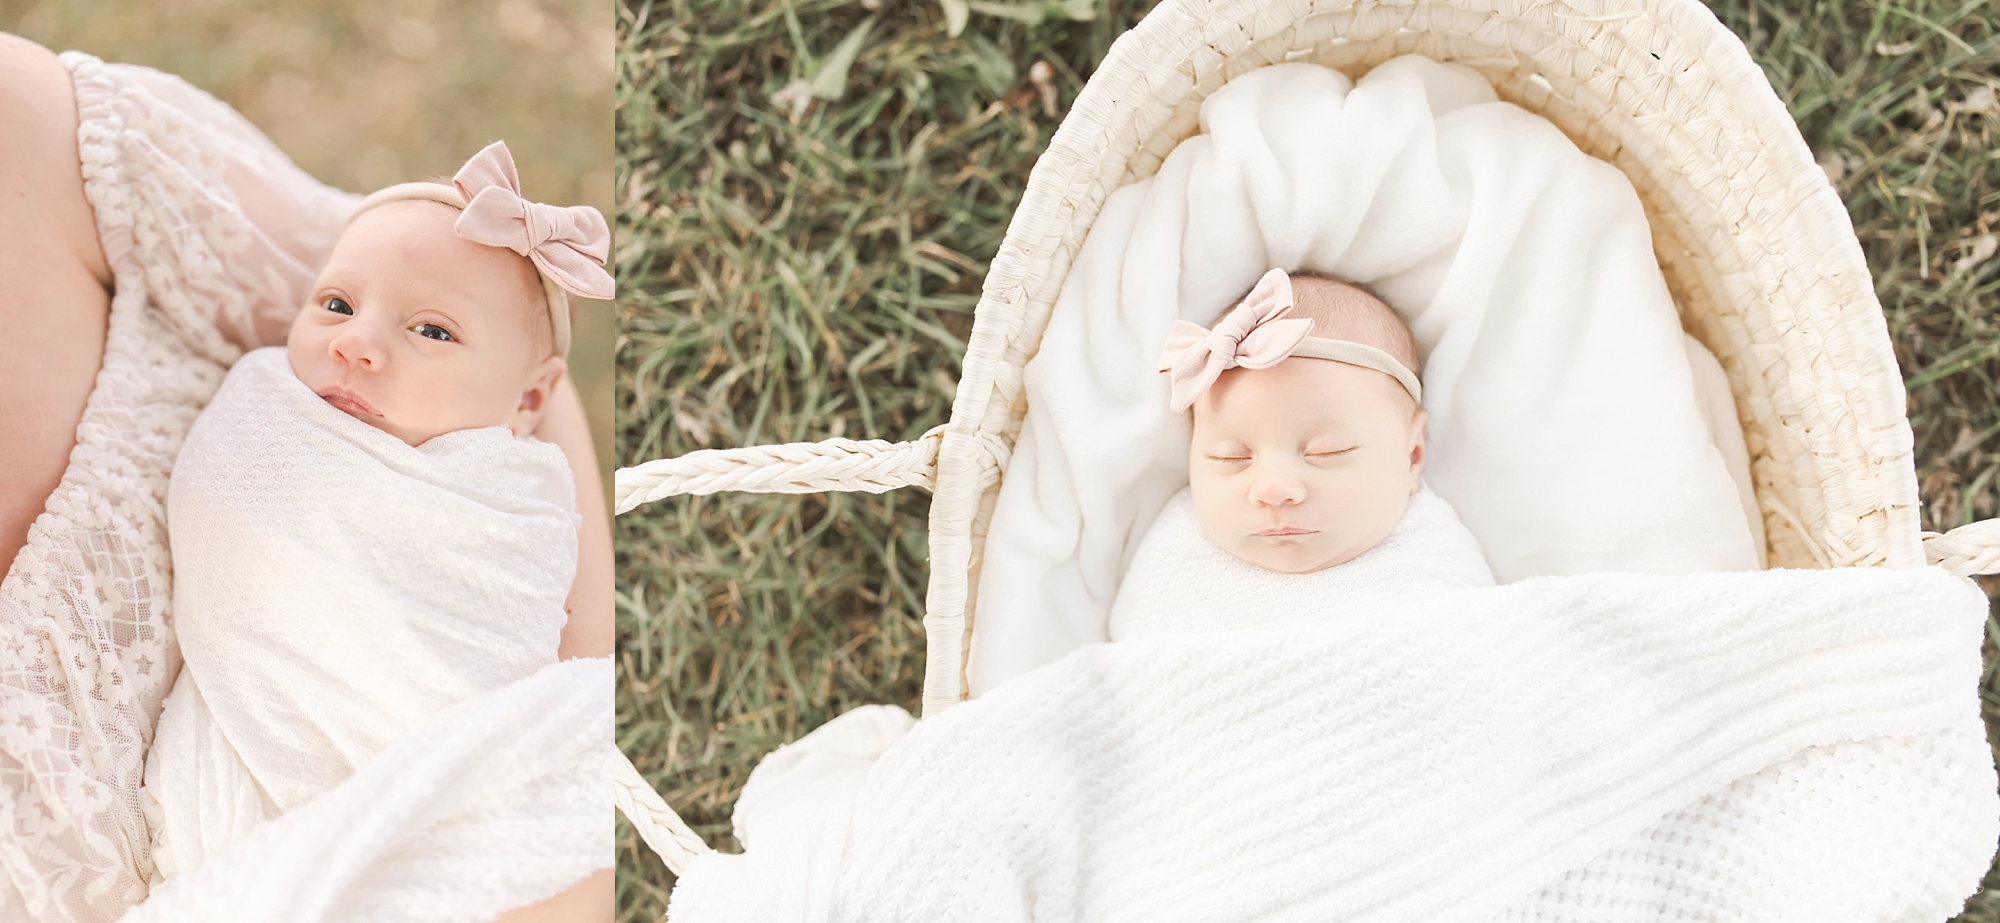 Venetia PA newborn photographer